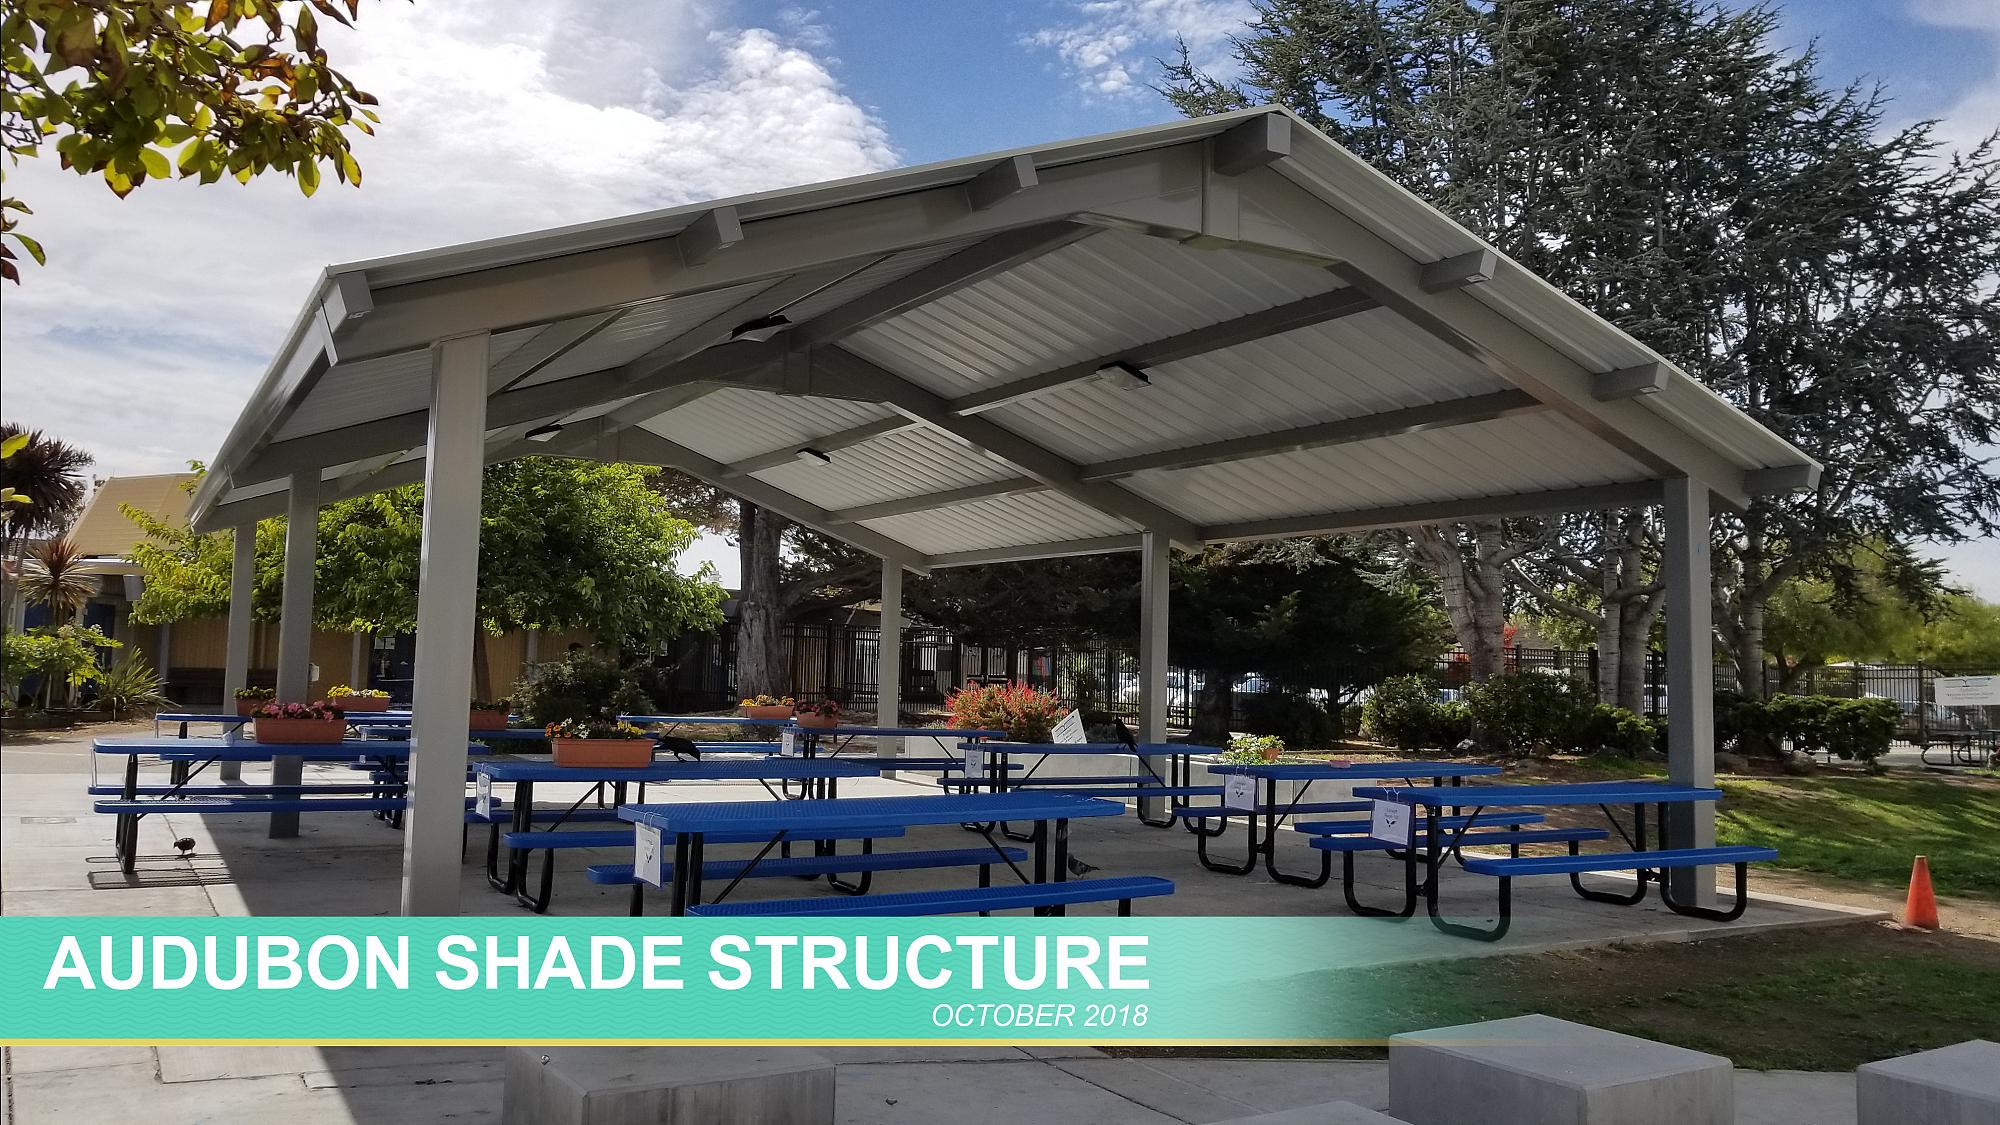 San Mateo Foster City School District – Audubon Shade Structure Within Audubon Calendars 2021 Foster City